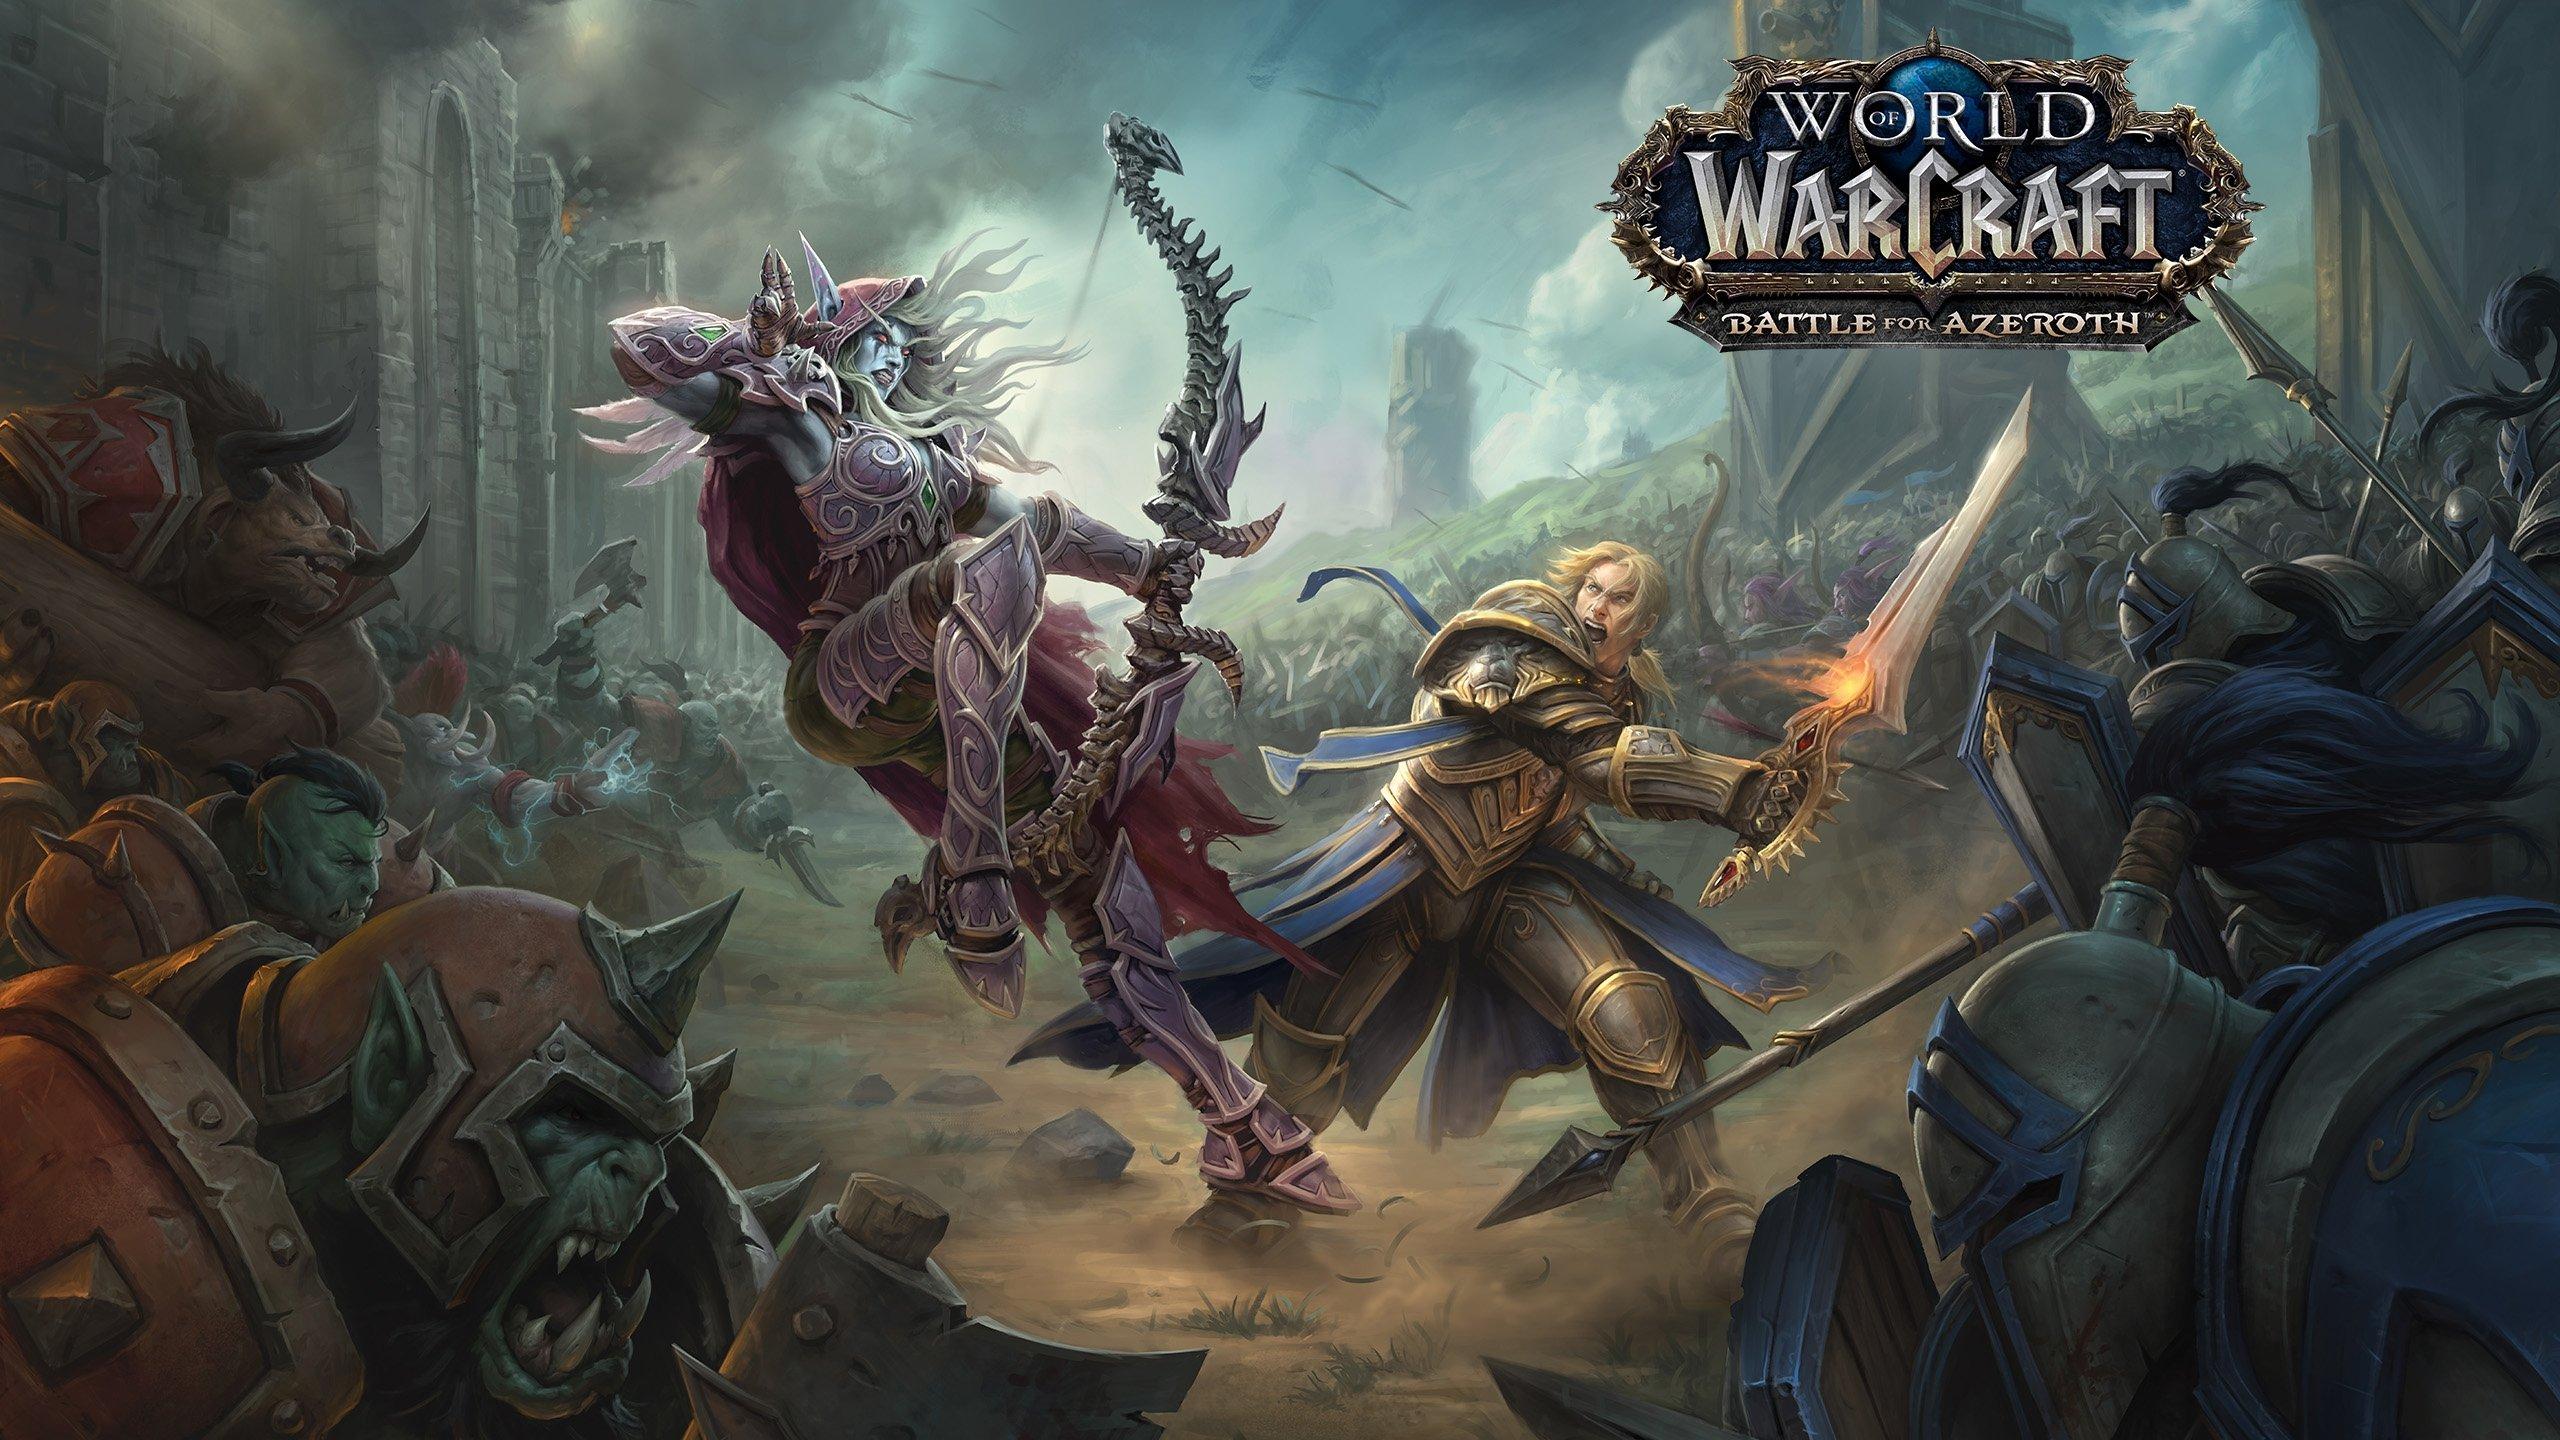 Аддон World ofWarcraft: Battle for Azeroth выходит вконце лета